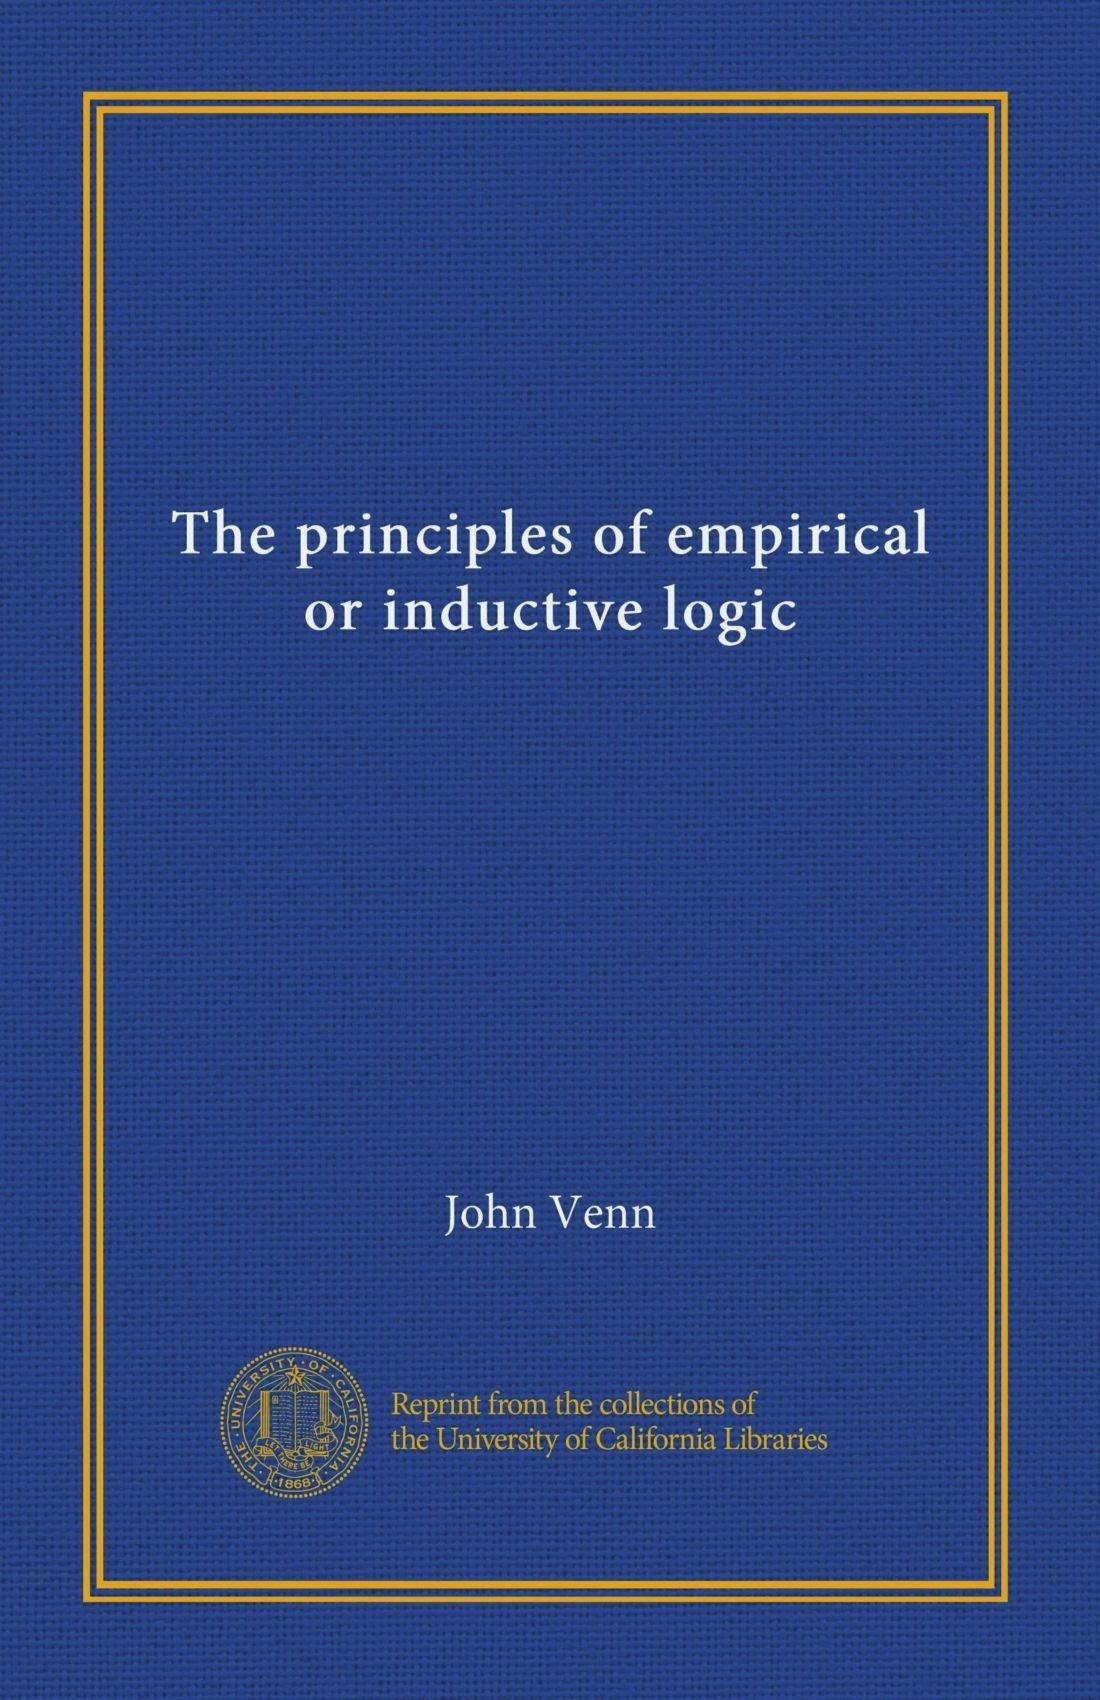 The principles of empirical or inductive logic pdf